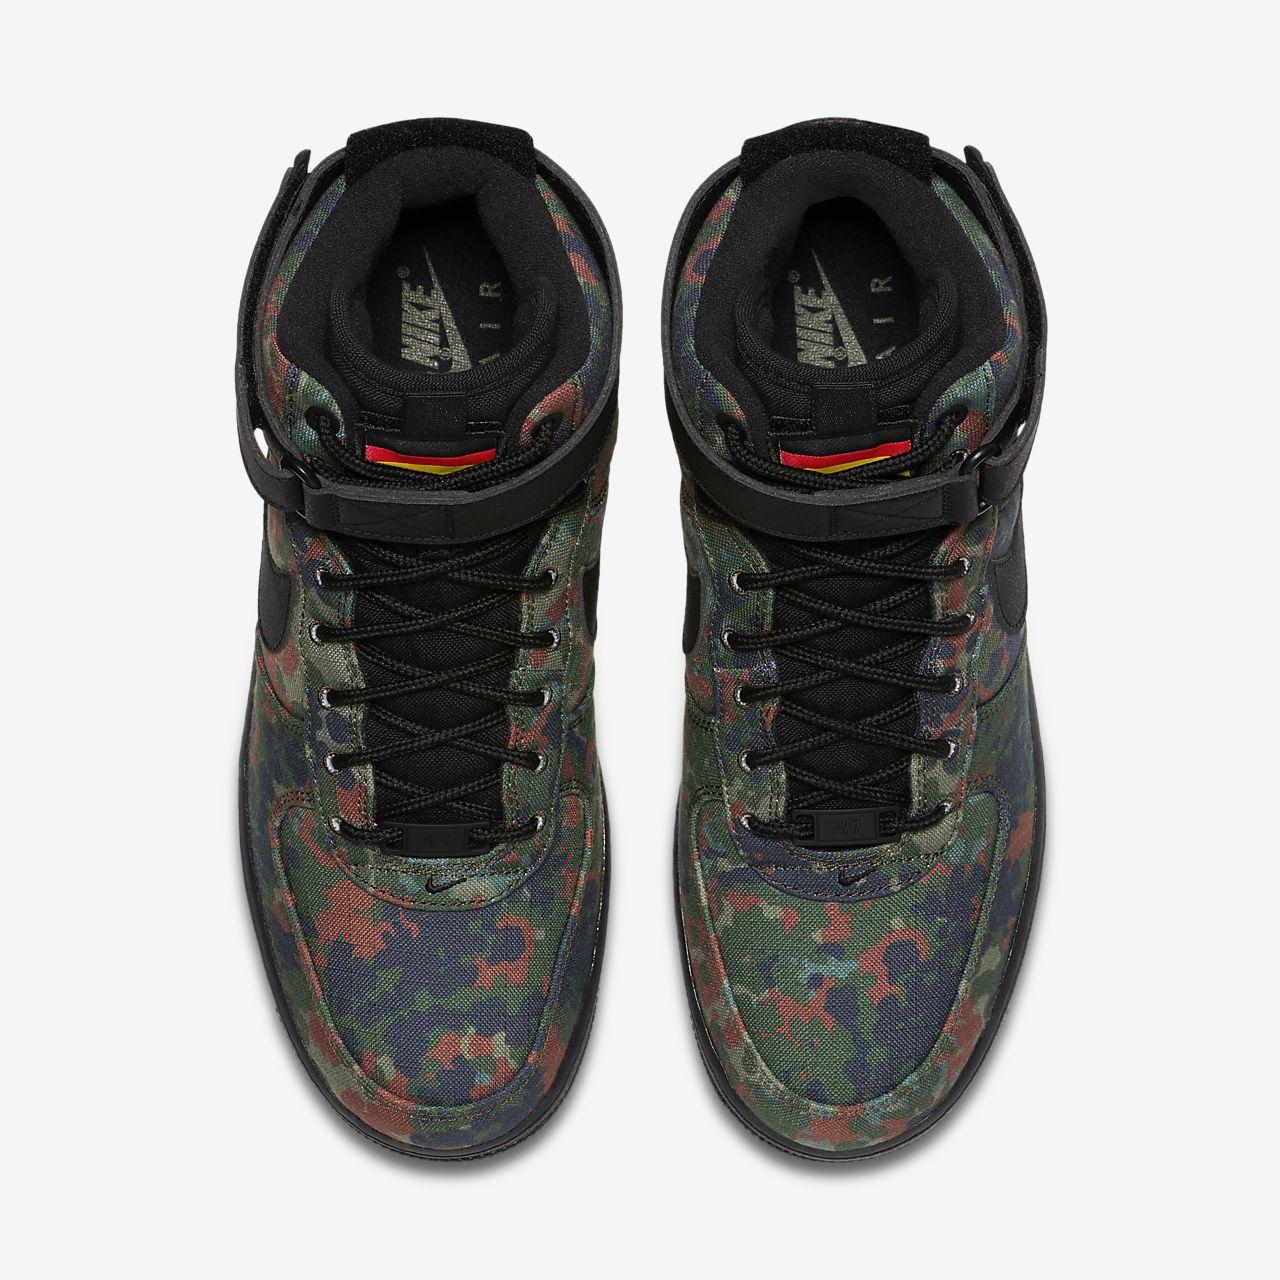 timeless design 28aa6 85bd1 ... Sko Nike Air Force 1 High 07 LV8 för män